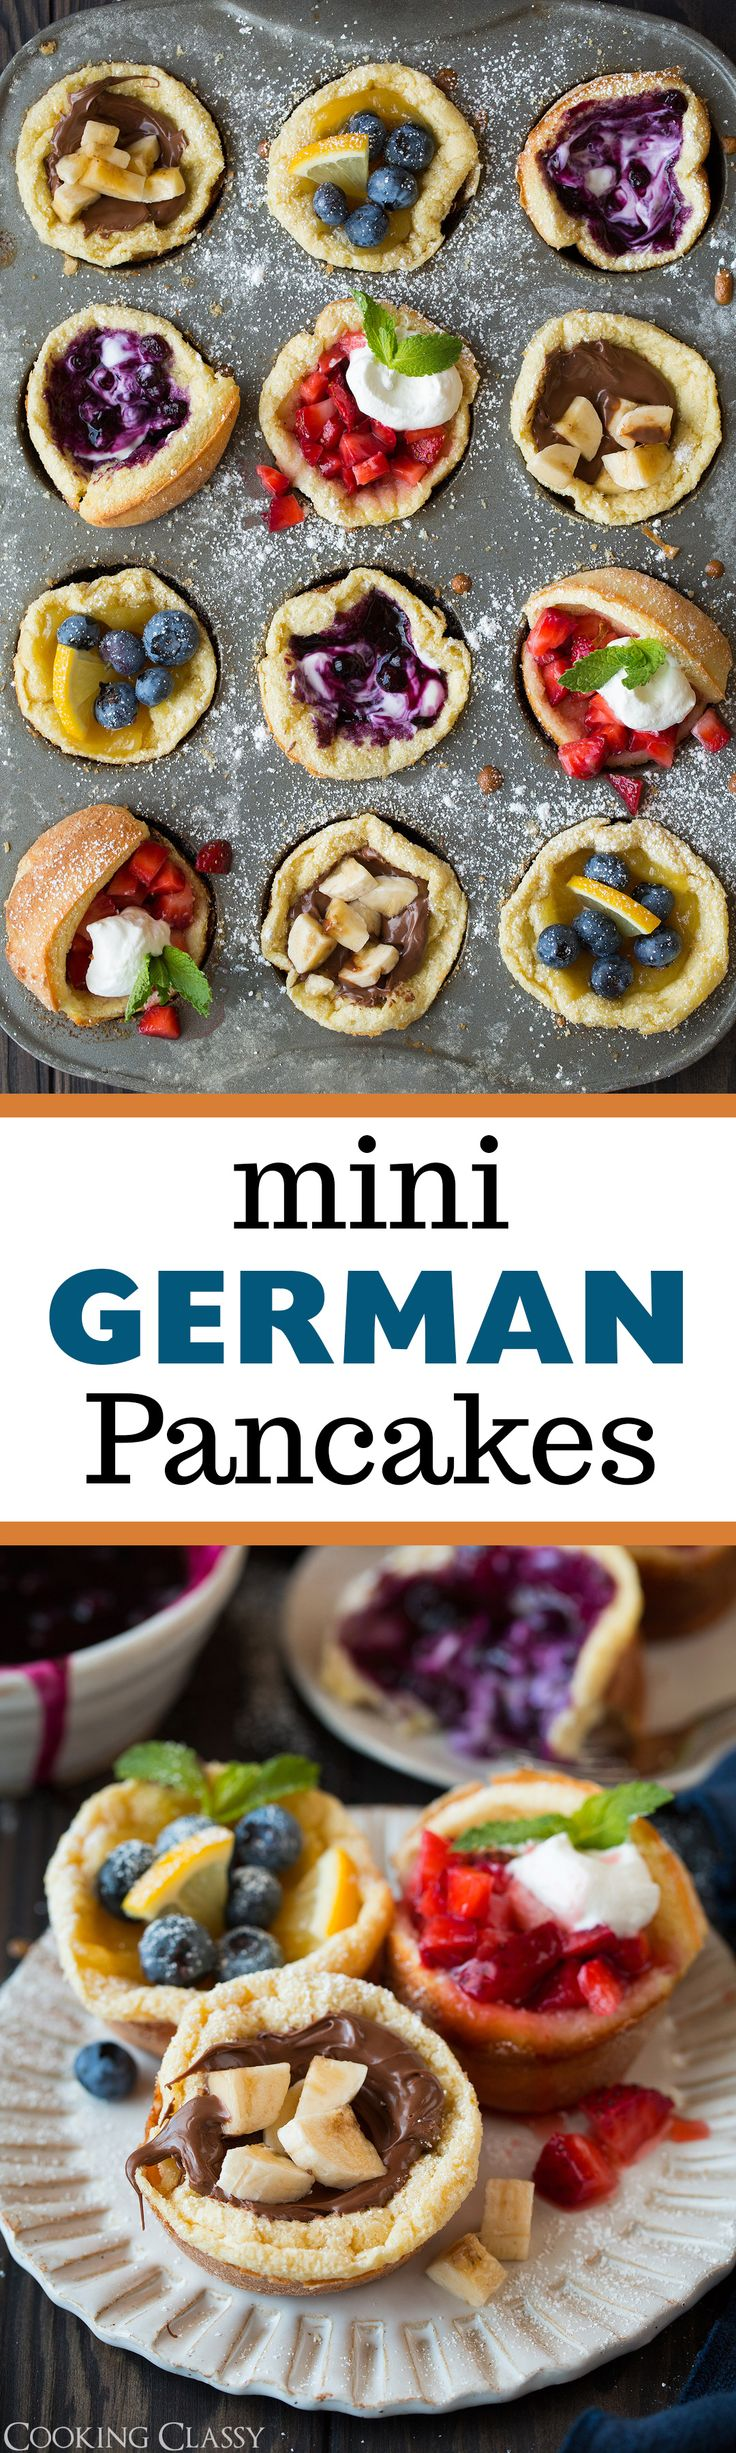 Mini German Pancakes - Cooking Classy